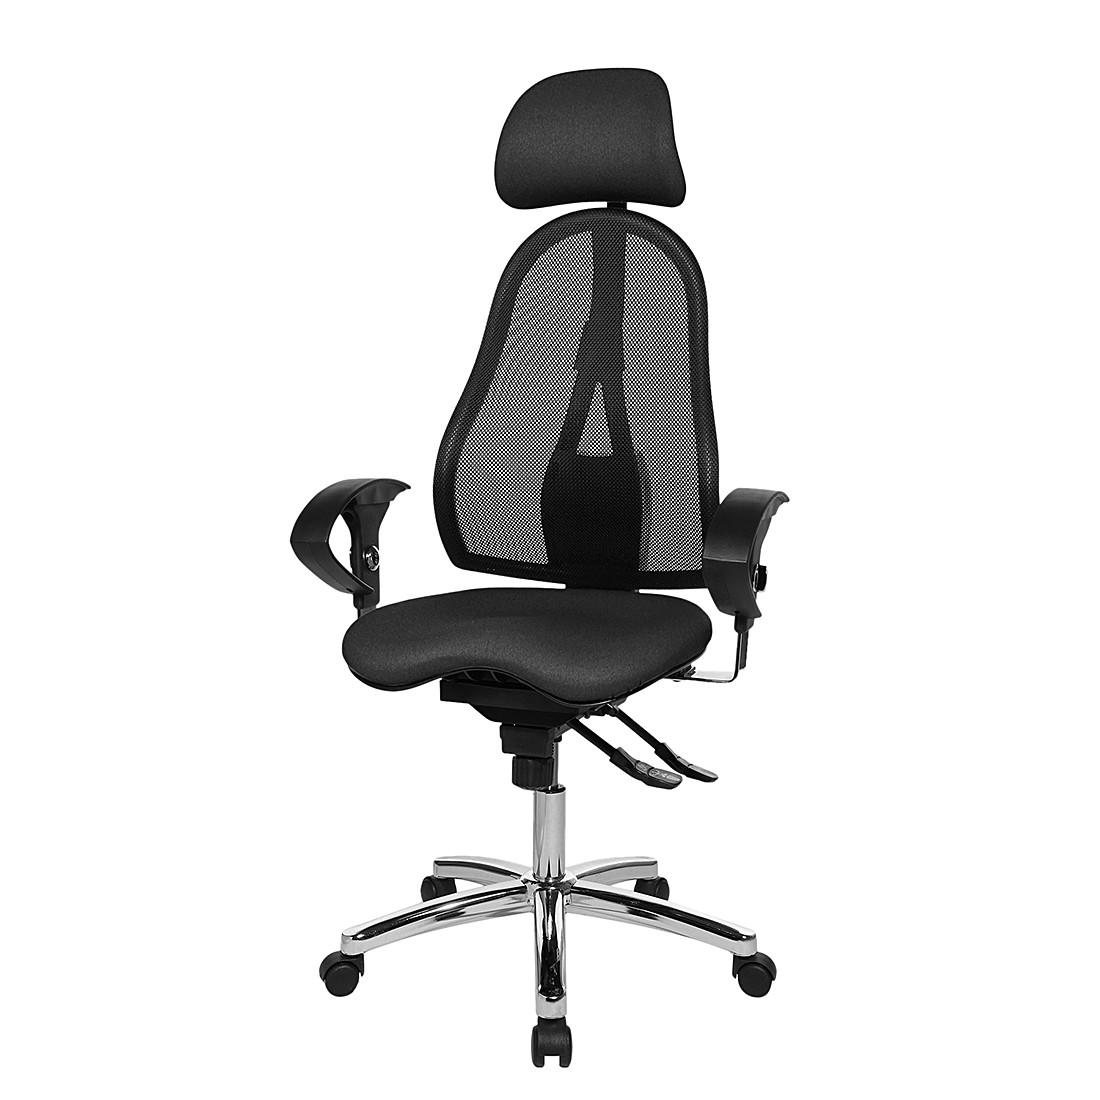 Bürodrehstuhl Sitness 45 – Schwarz / Anthrazit, Topstar online bestellen